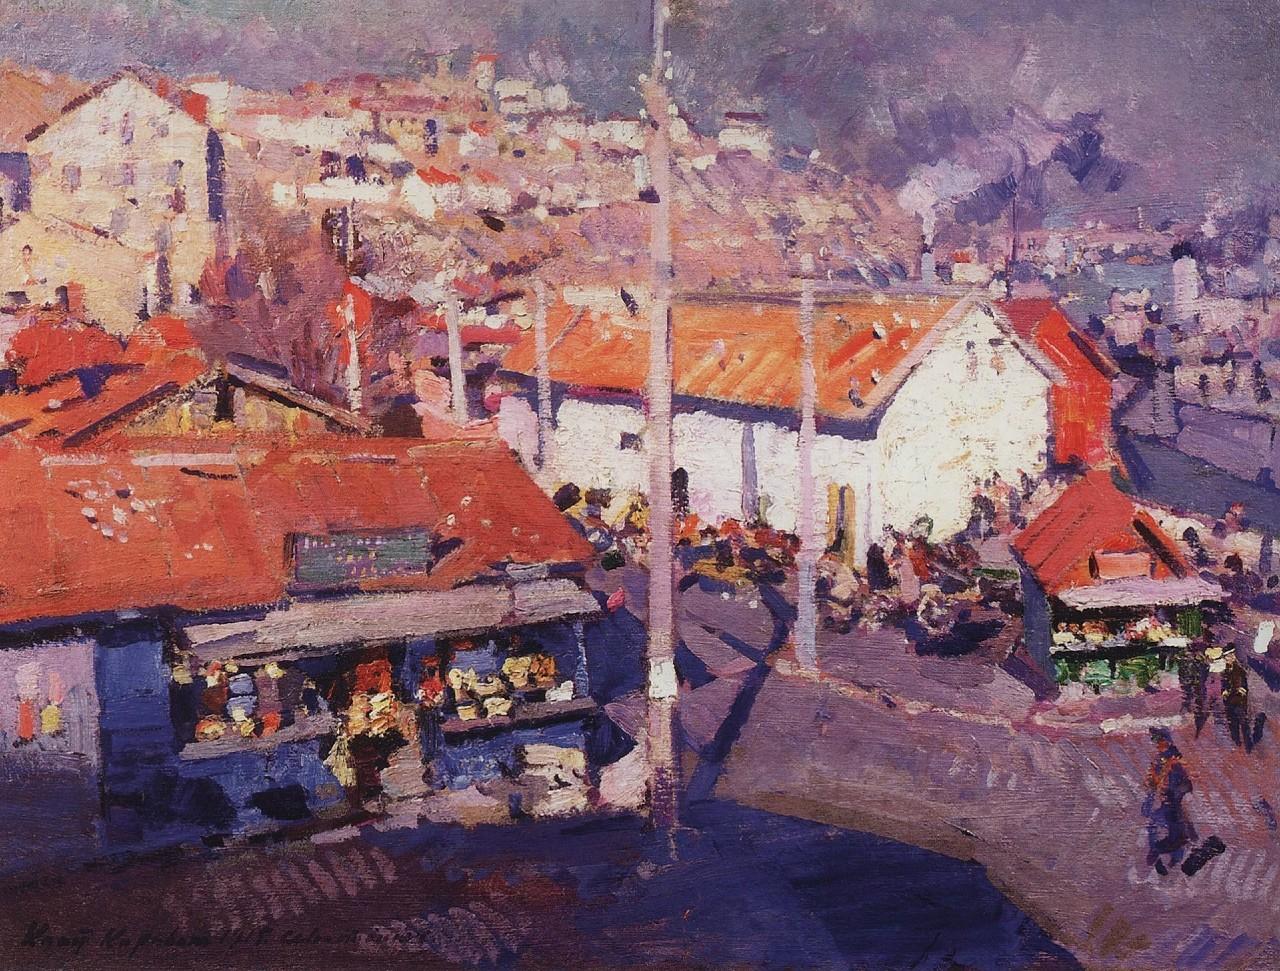 15-Севастопольский базар - 1915.jpg